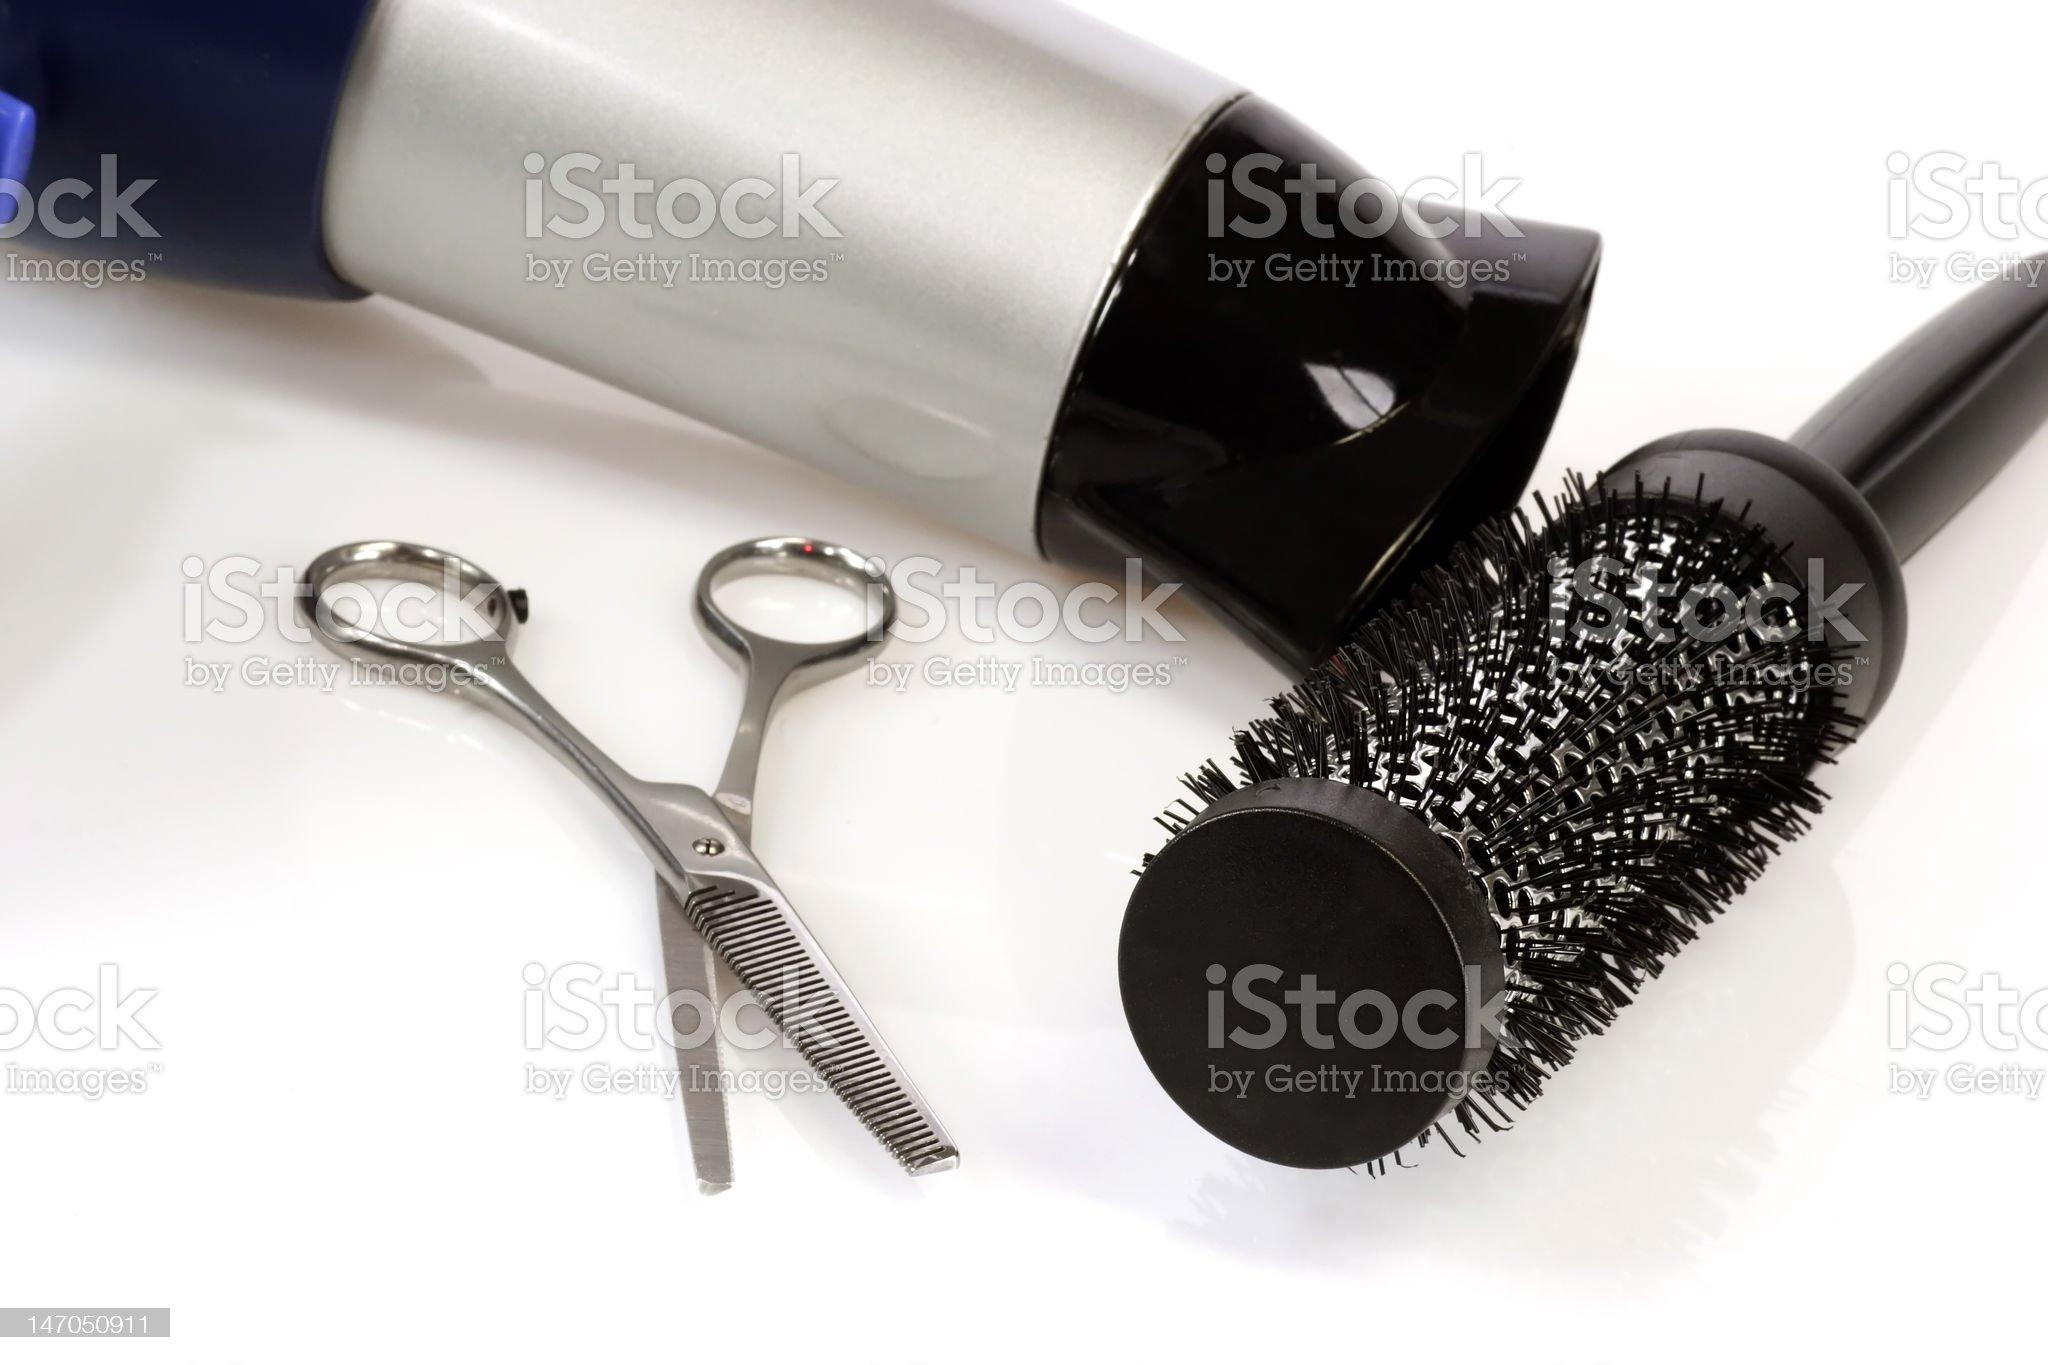 Barber Tools royalty-free stock photo